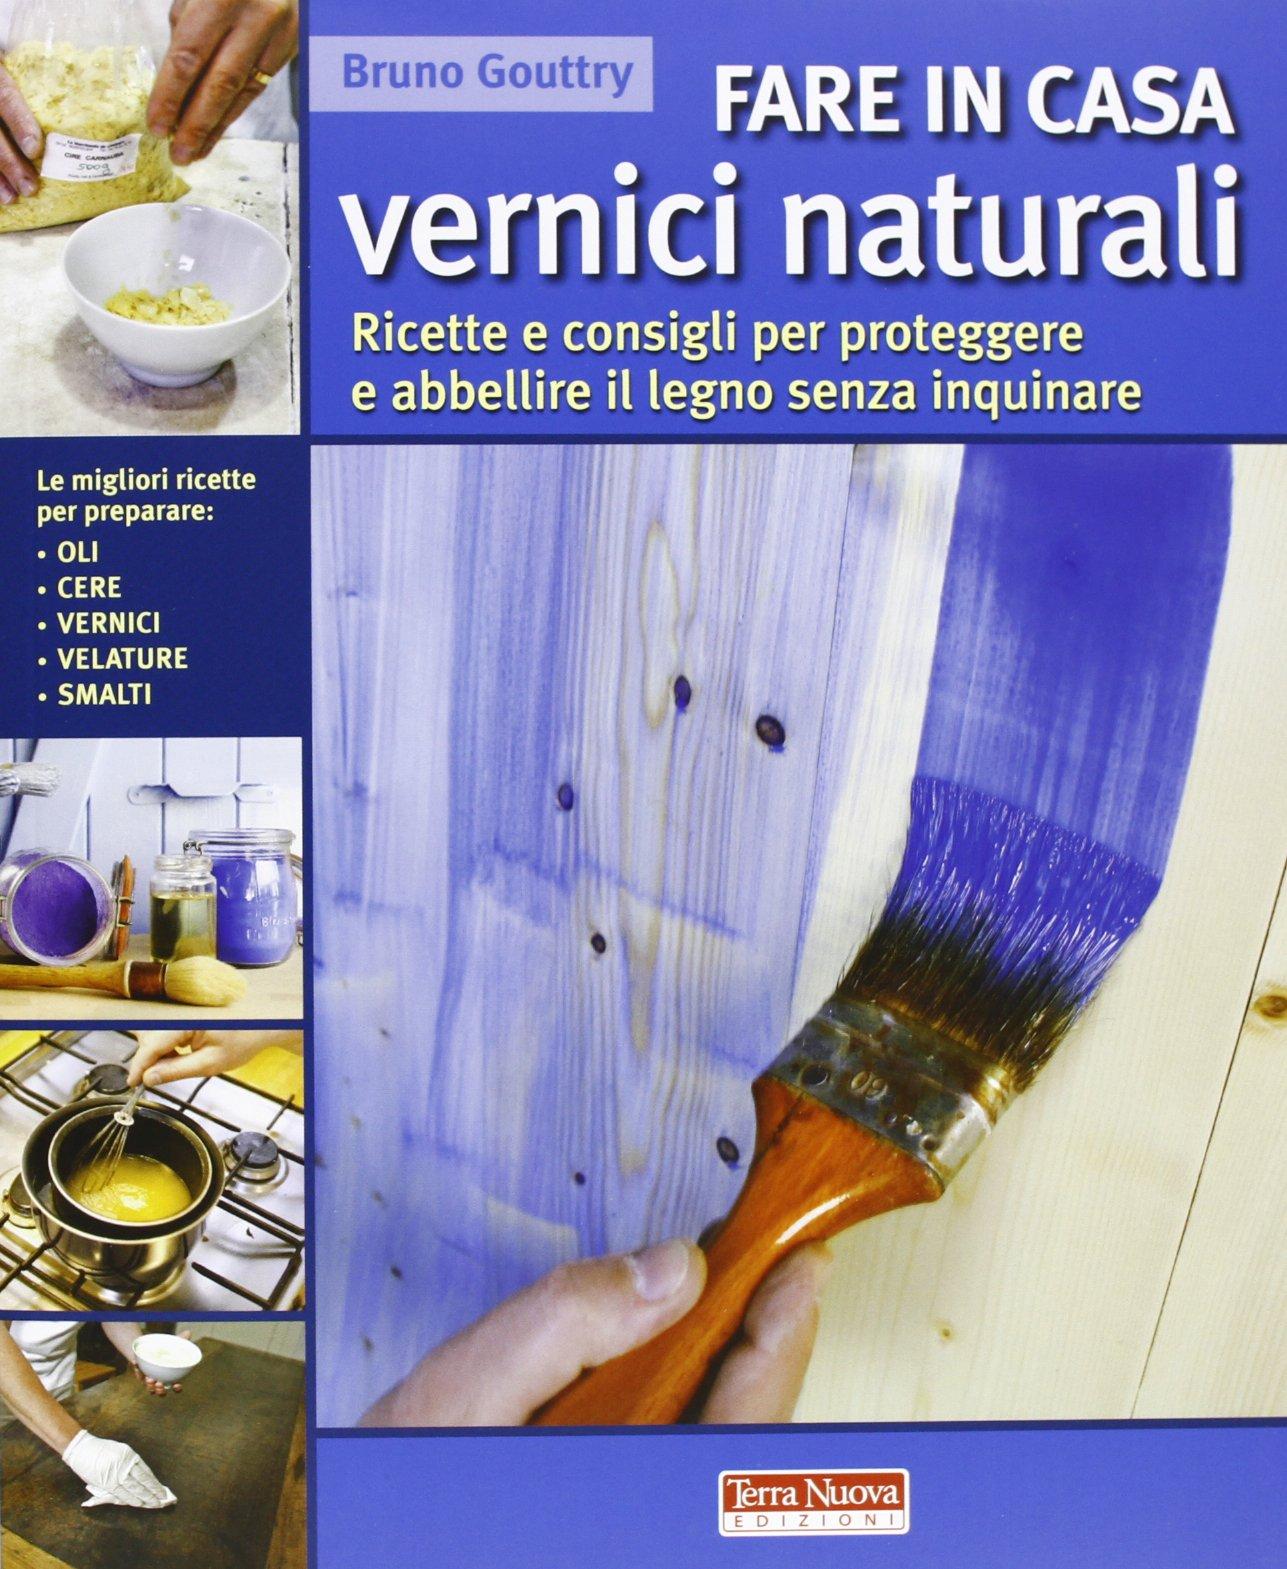 vernici naturali per legno